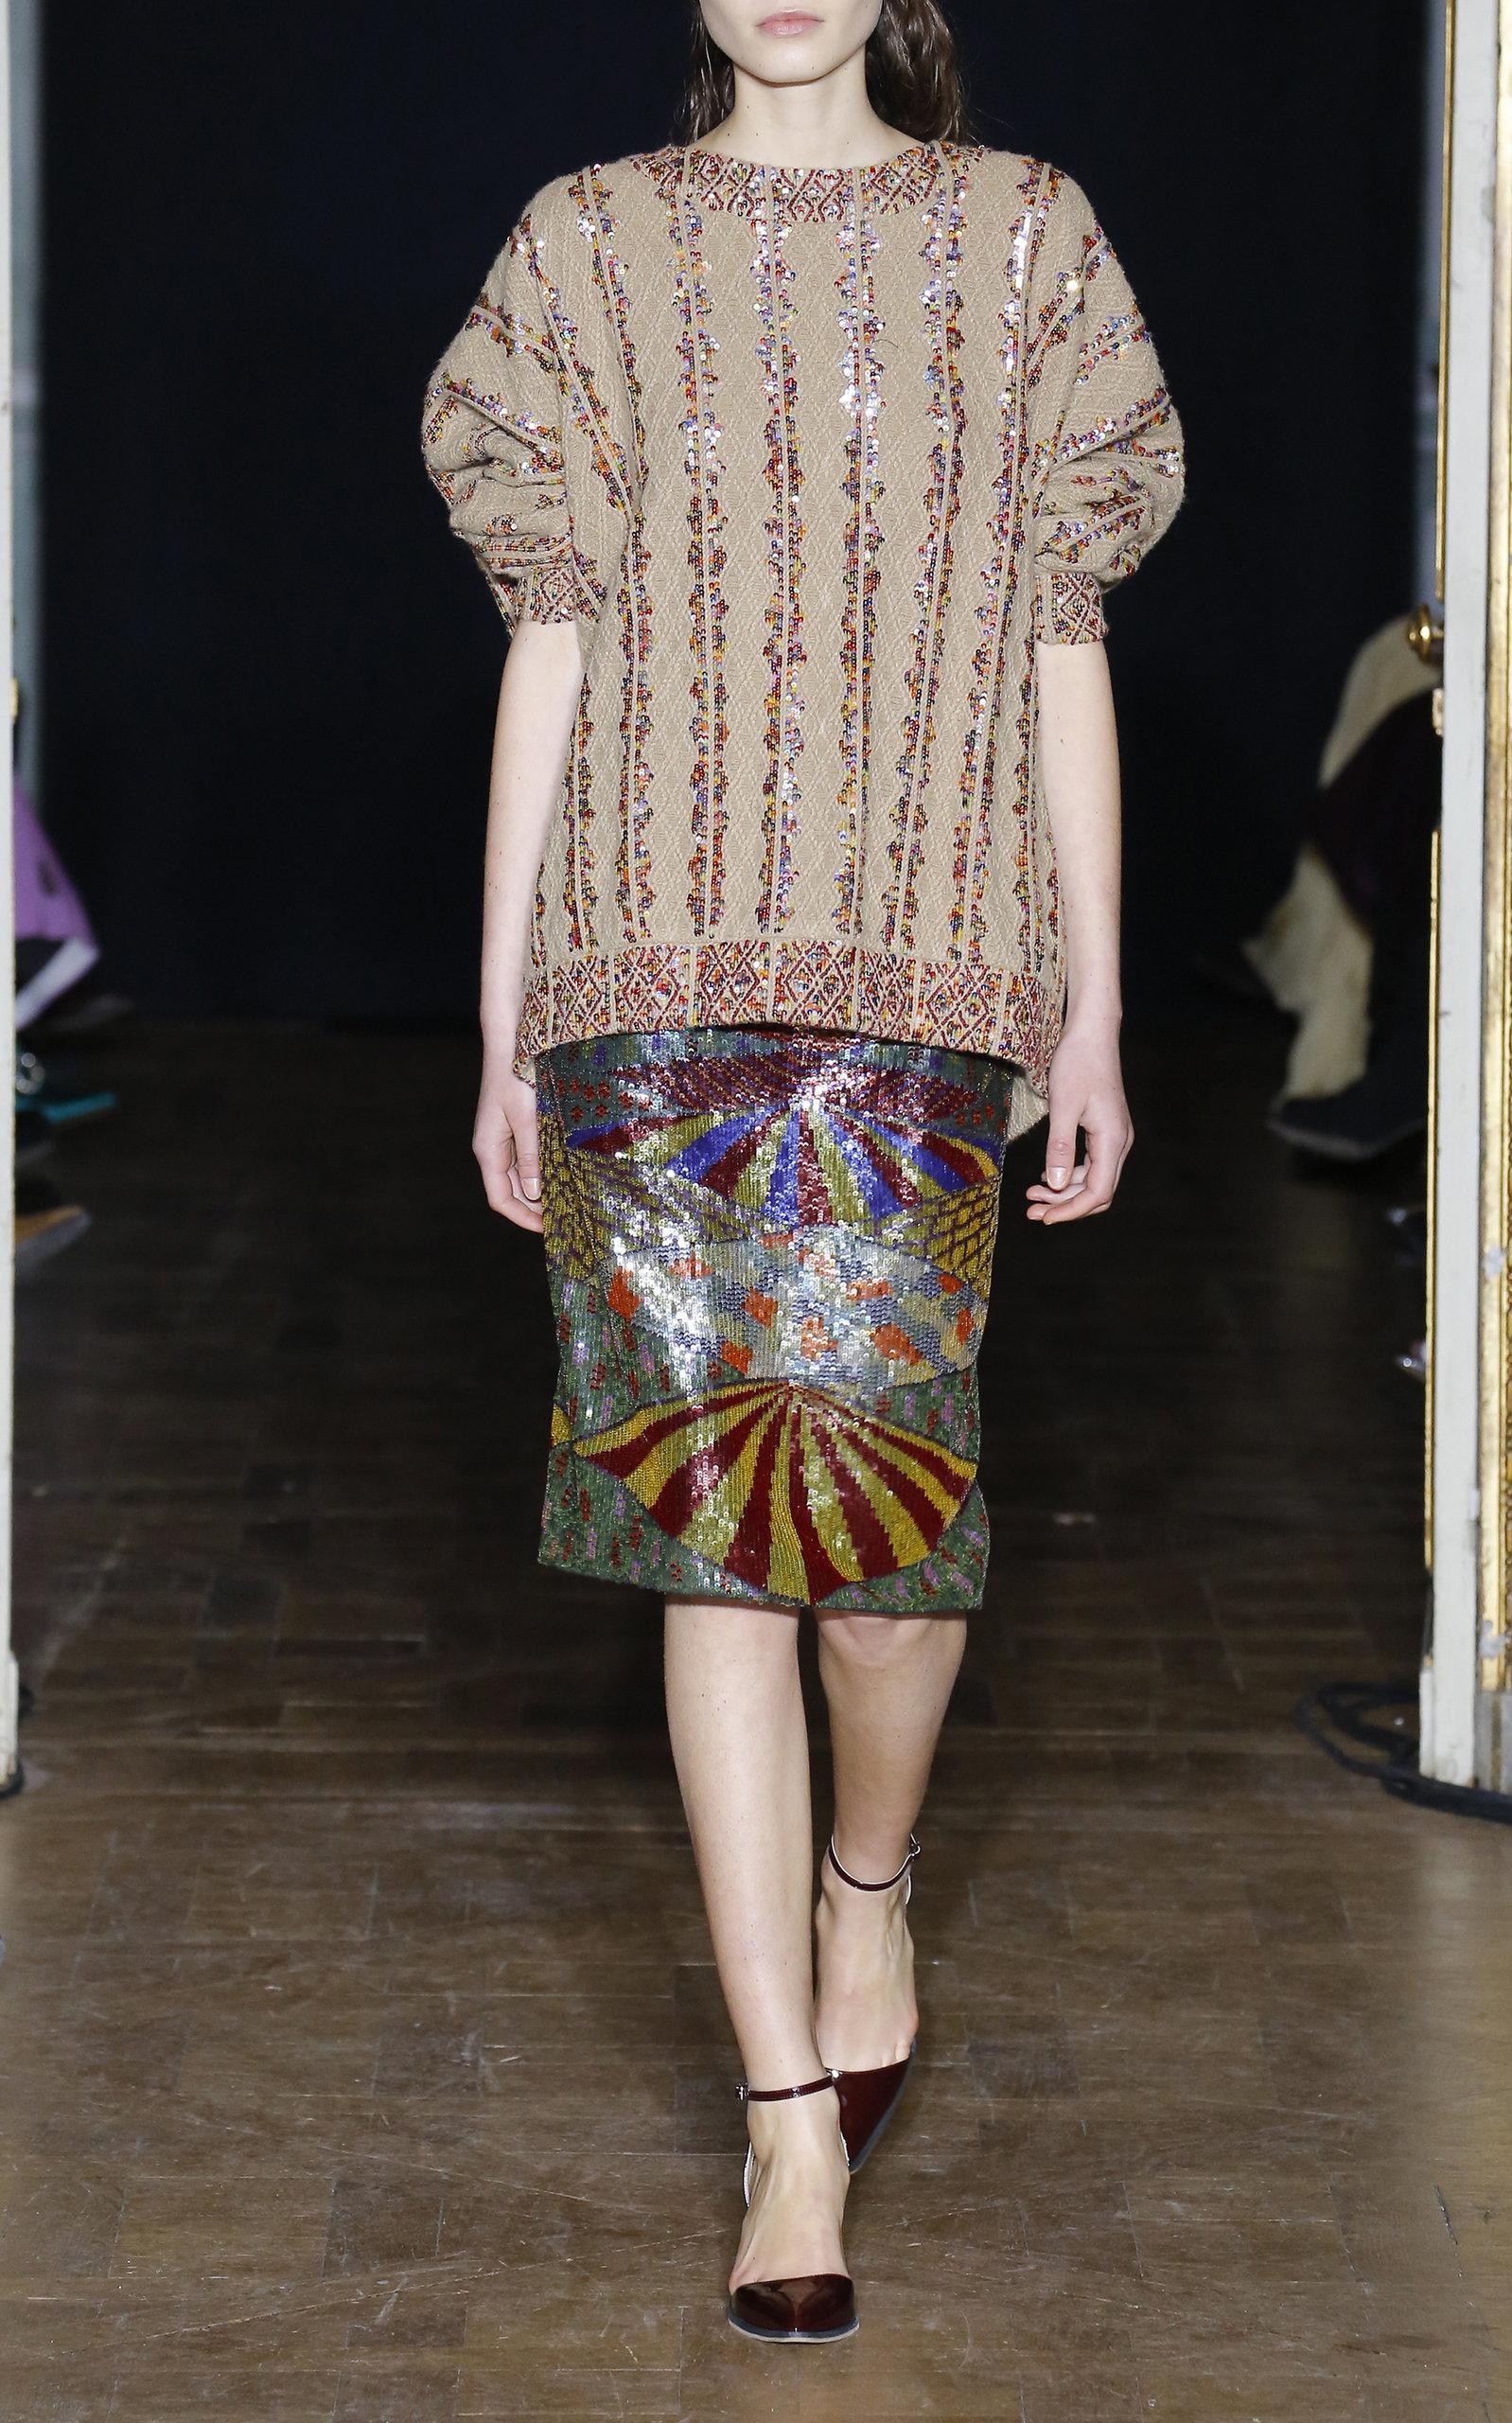 Hase Embellished Sweater By Rahul Mishra Moda Operandi Sandal Sehat